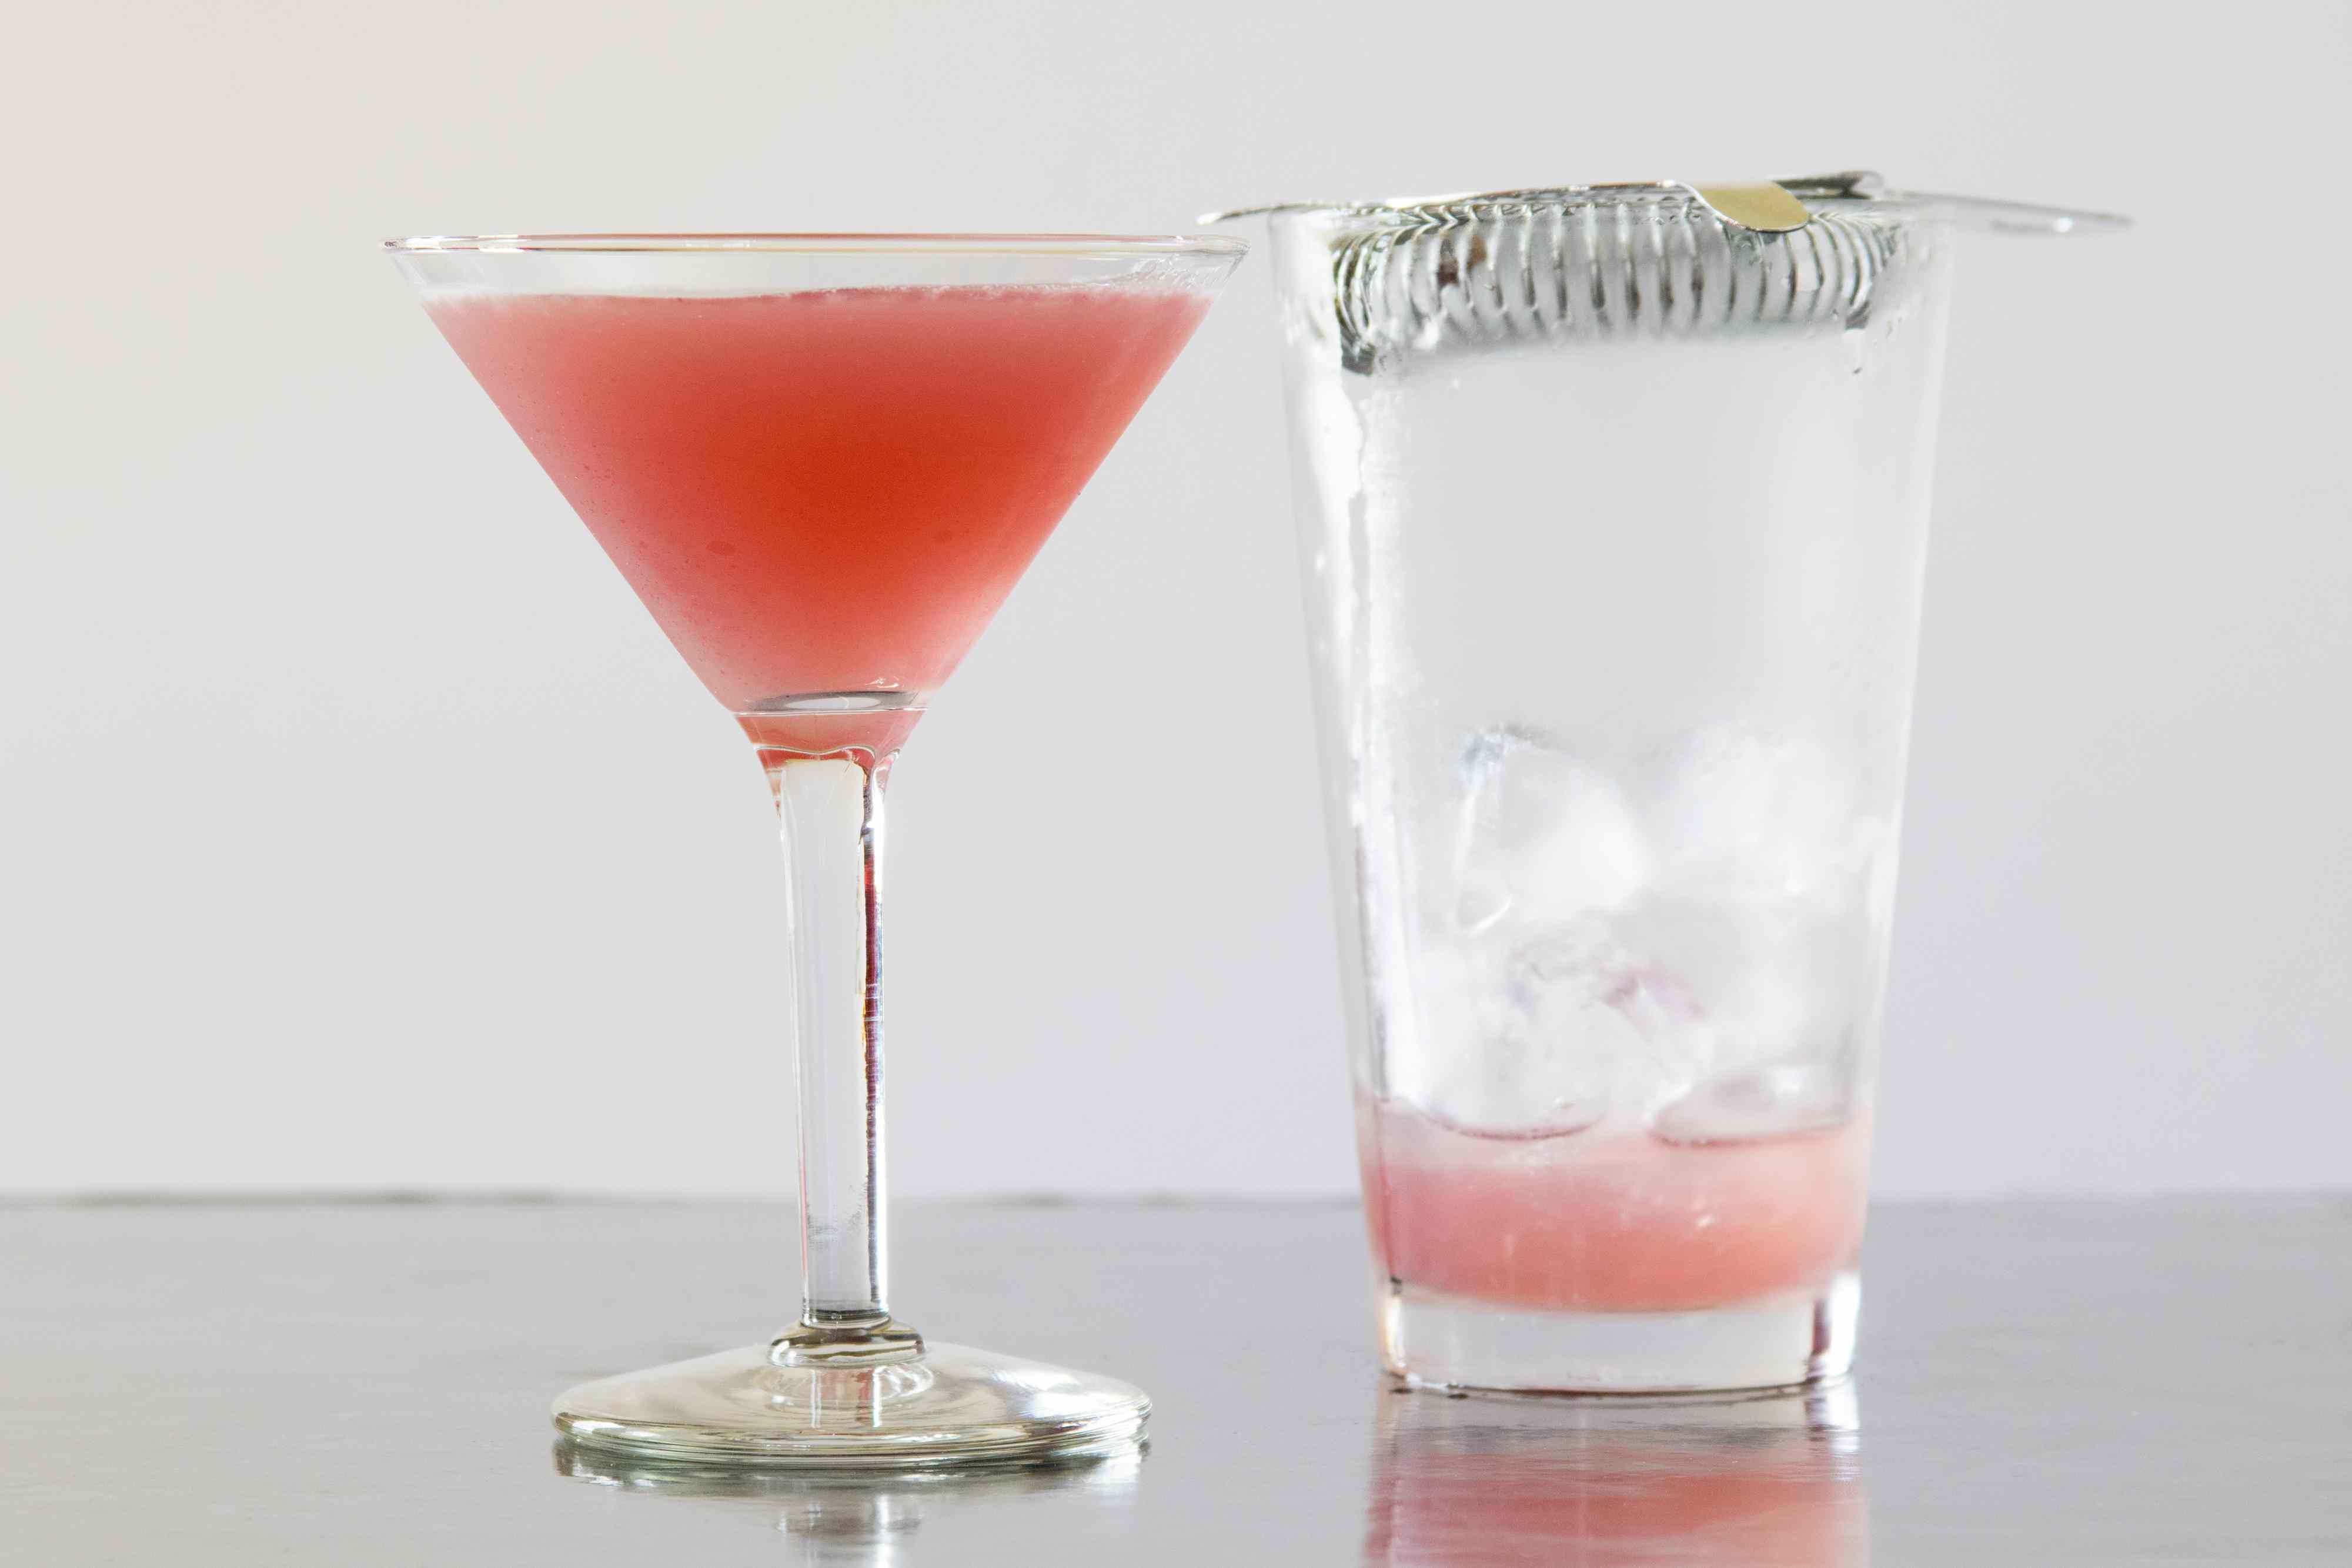 Straining a Pomegranate Martini